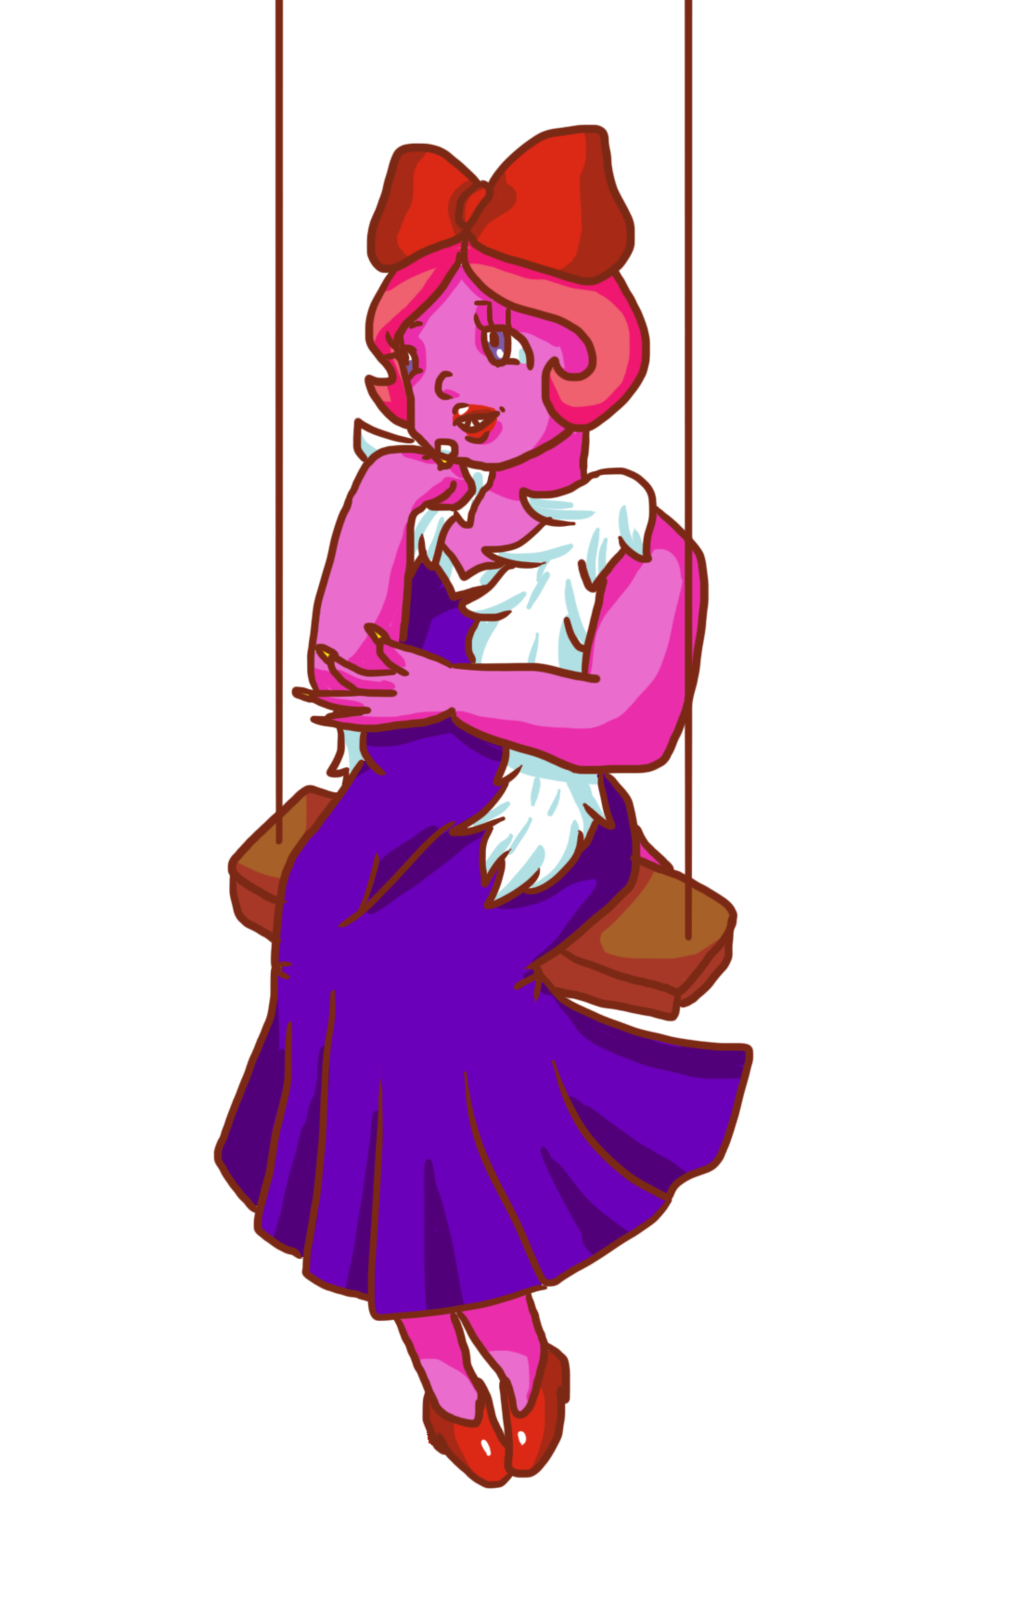 Princess Peach clipart kitty Princess Peach Super on Birdo